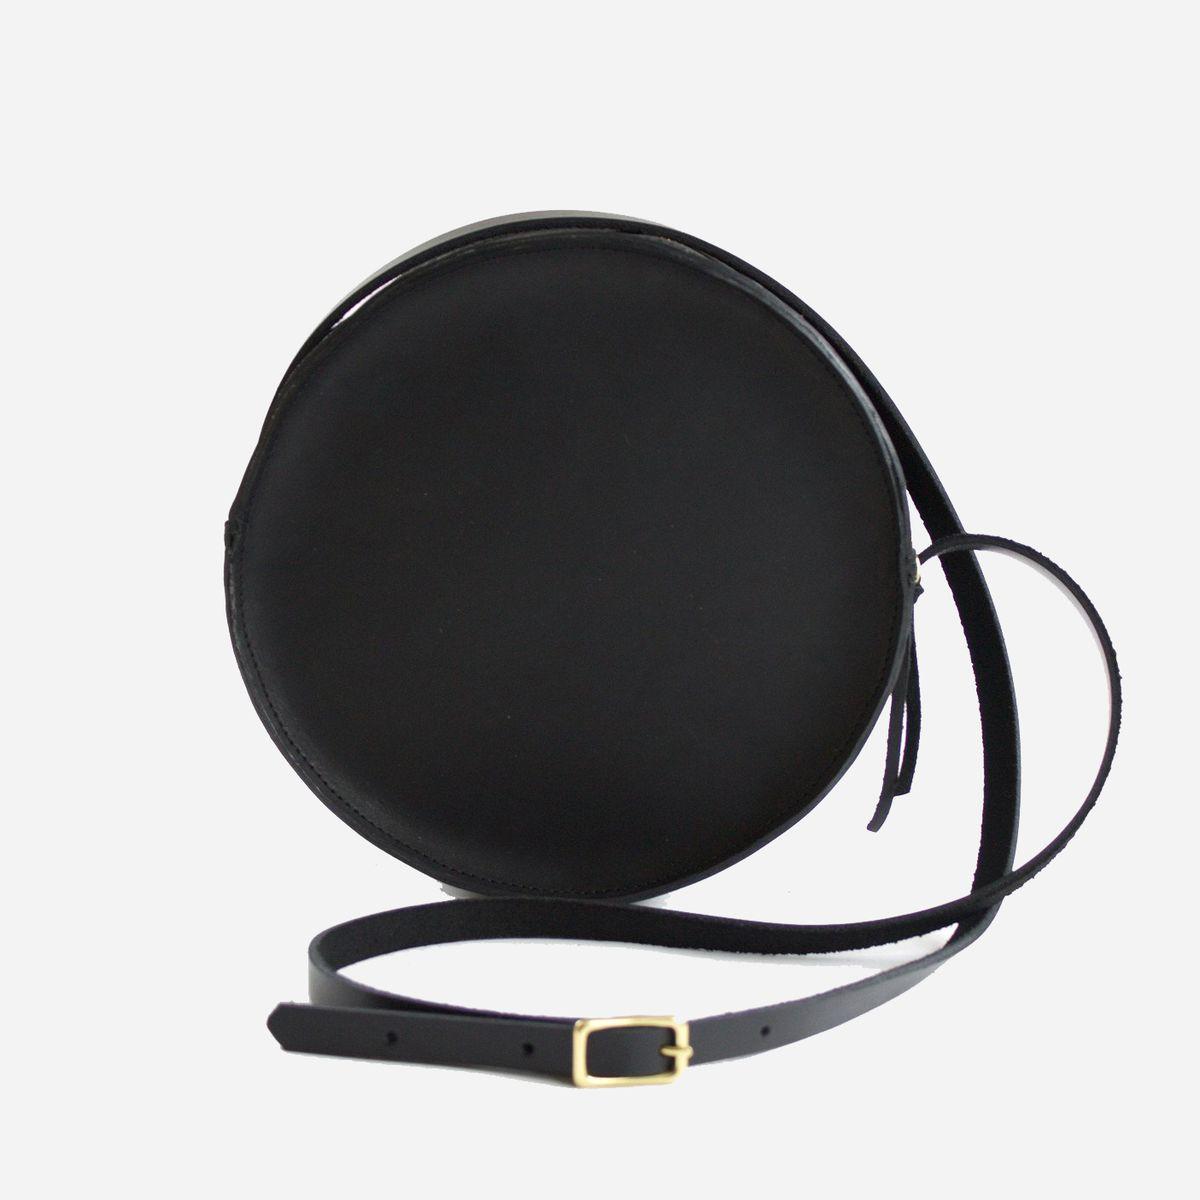 A circlular black bag